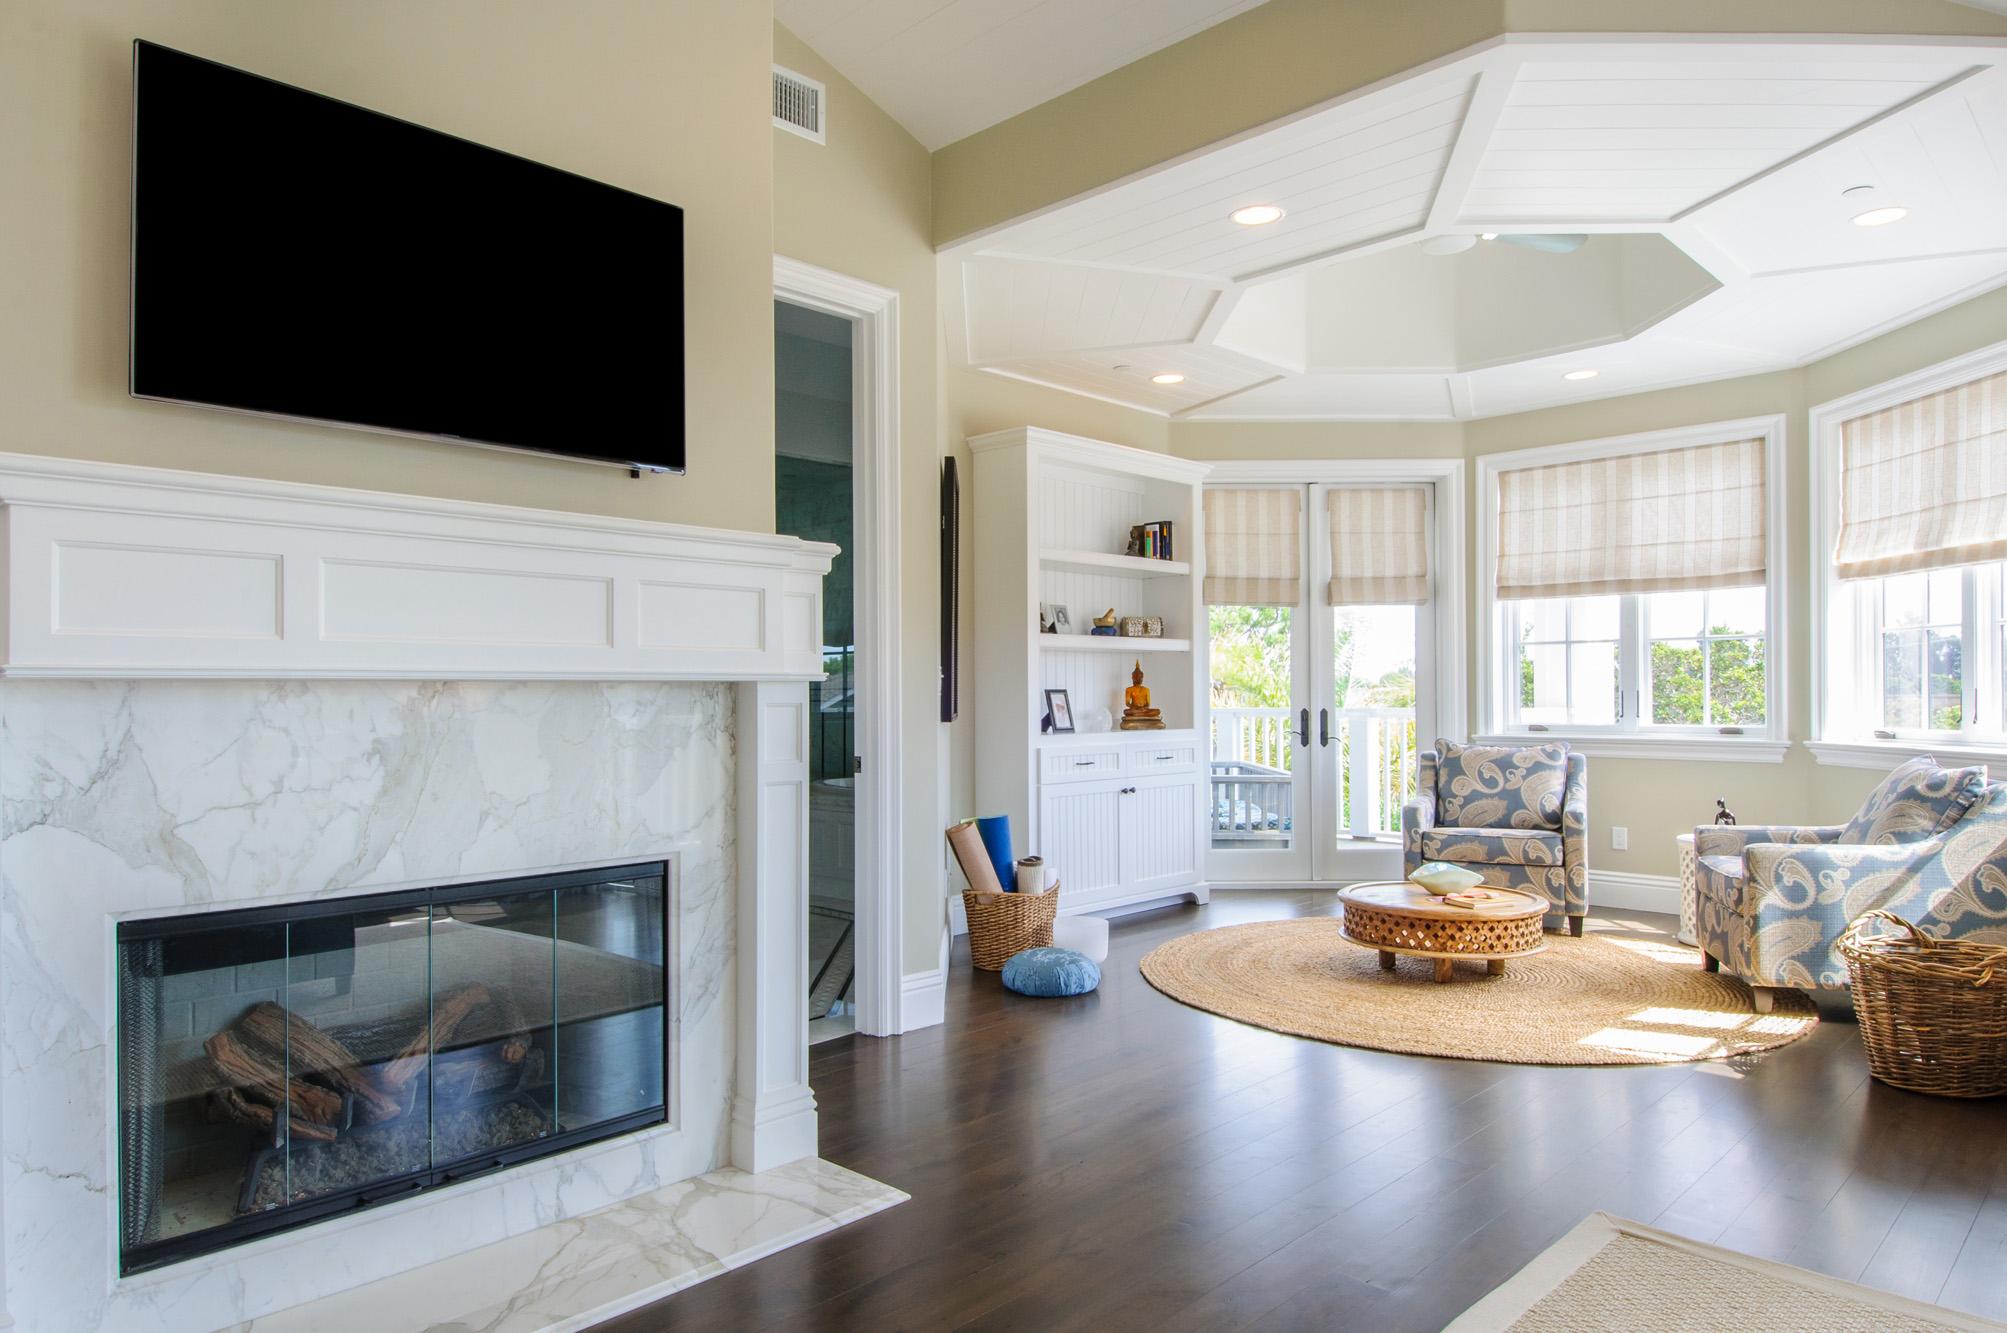 capecod - marble fireplace - walnut floors.jpg